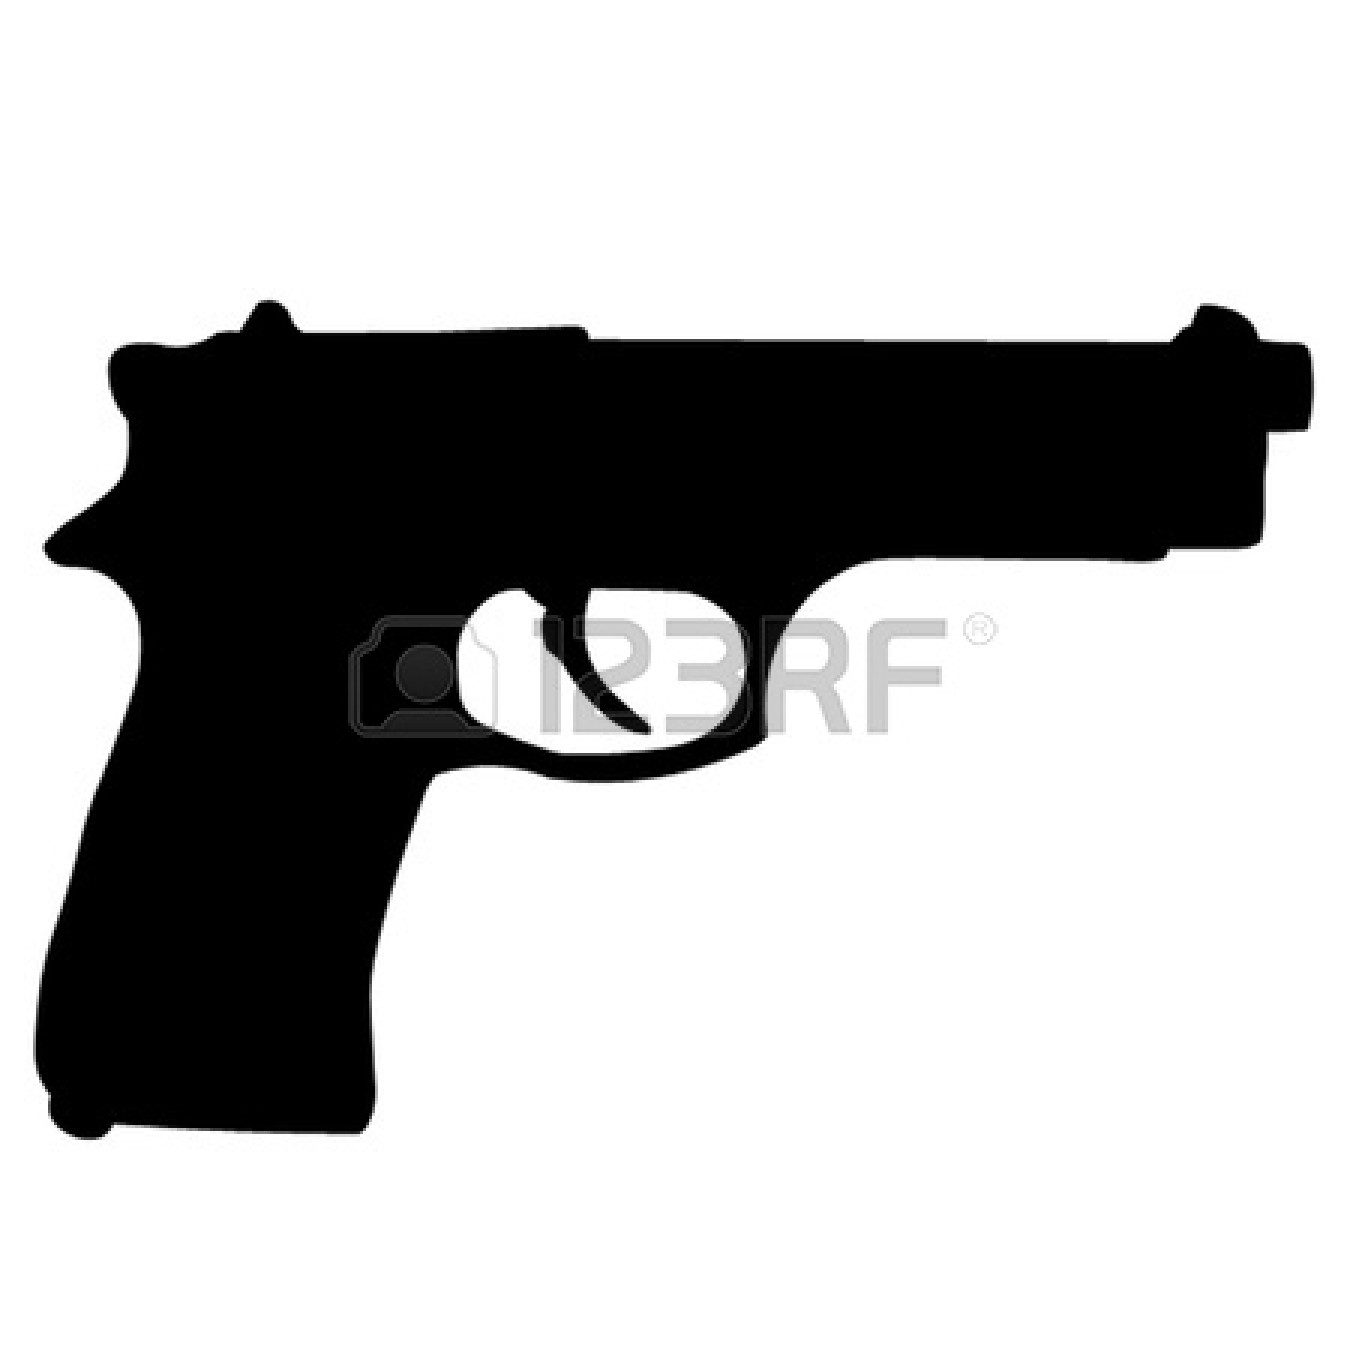 shooting gun clipart-shooting gun clipart-11